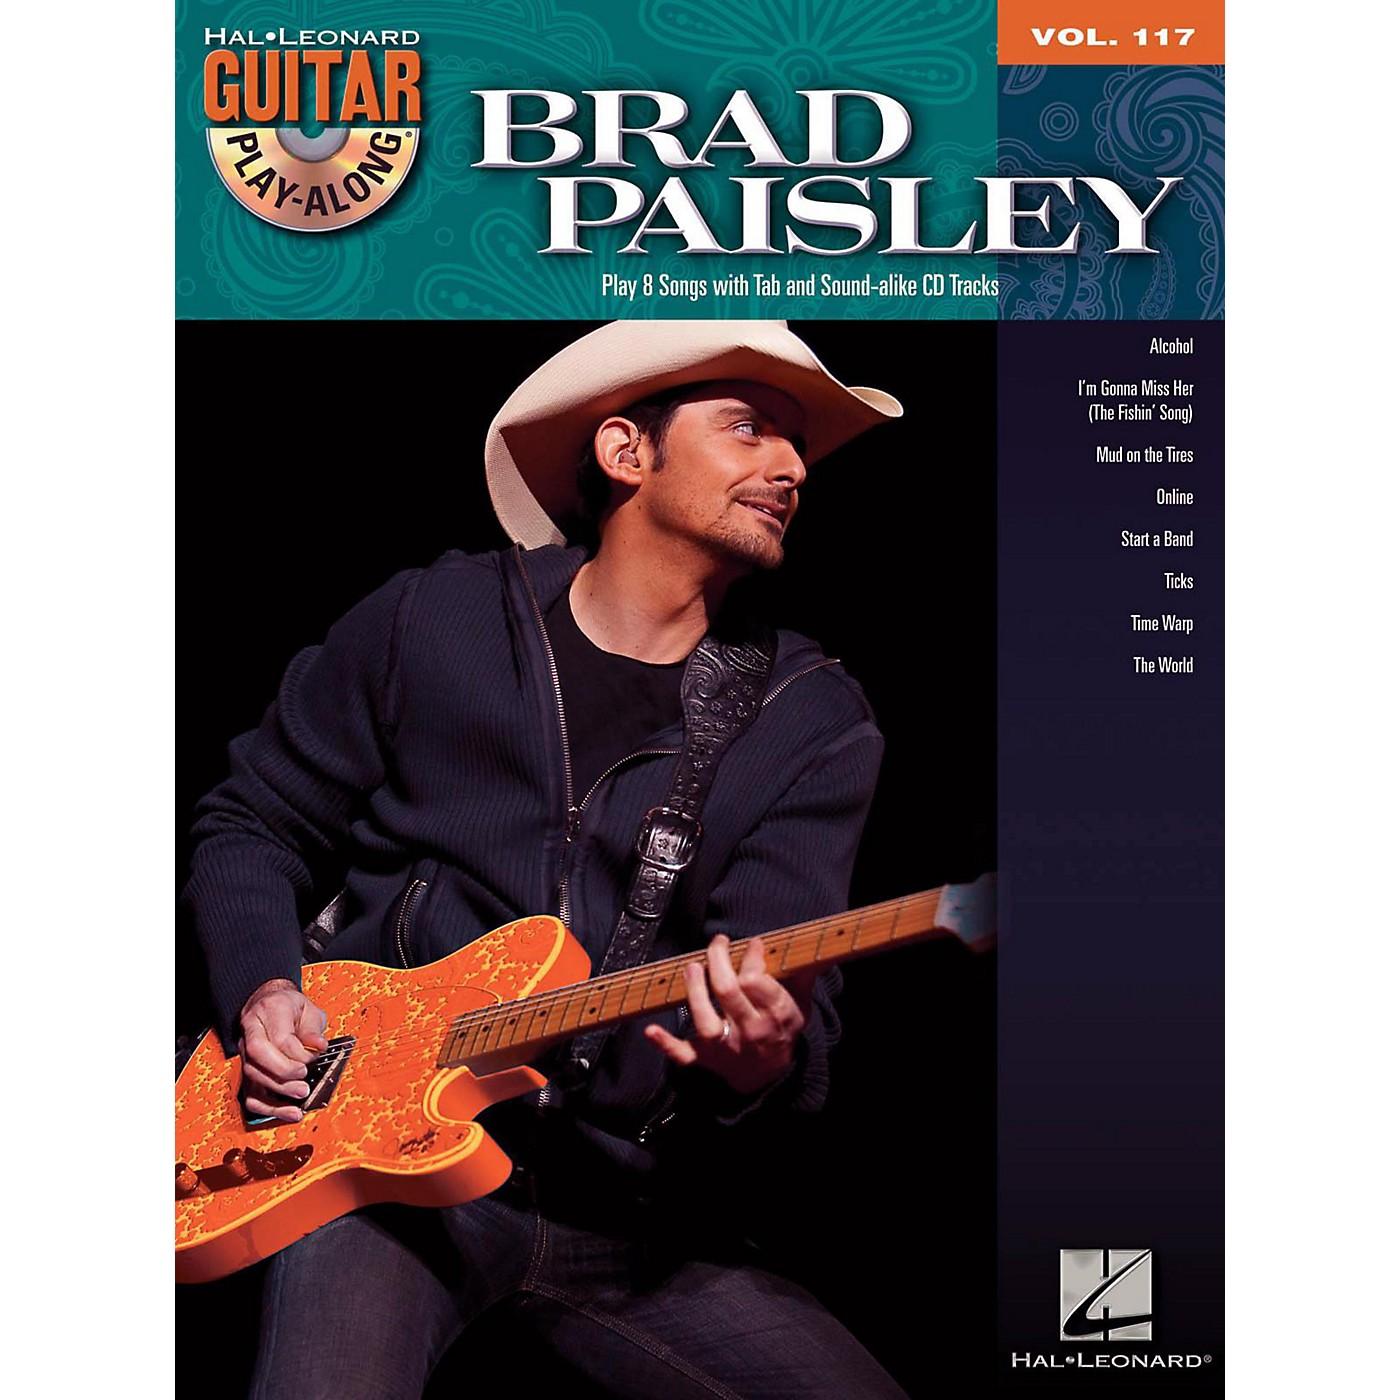 Hal Leonard Brad Paisley - Guitar Play-Along Volume 117 Book/CD thumbnail